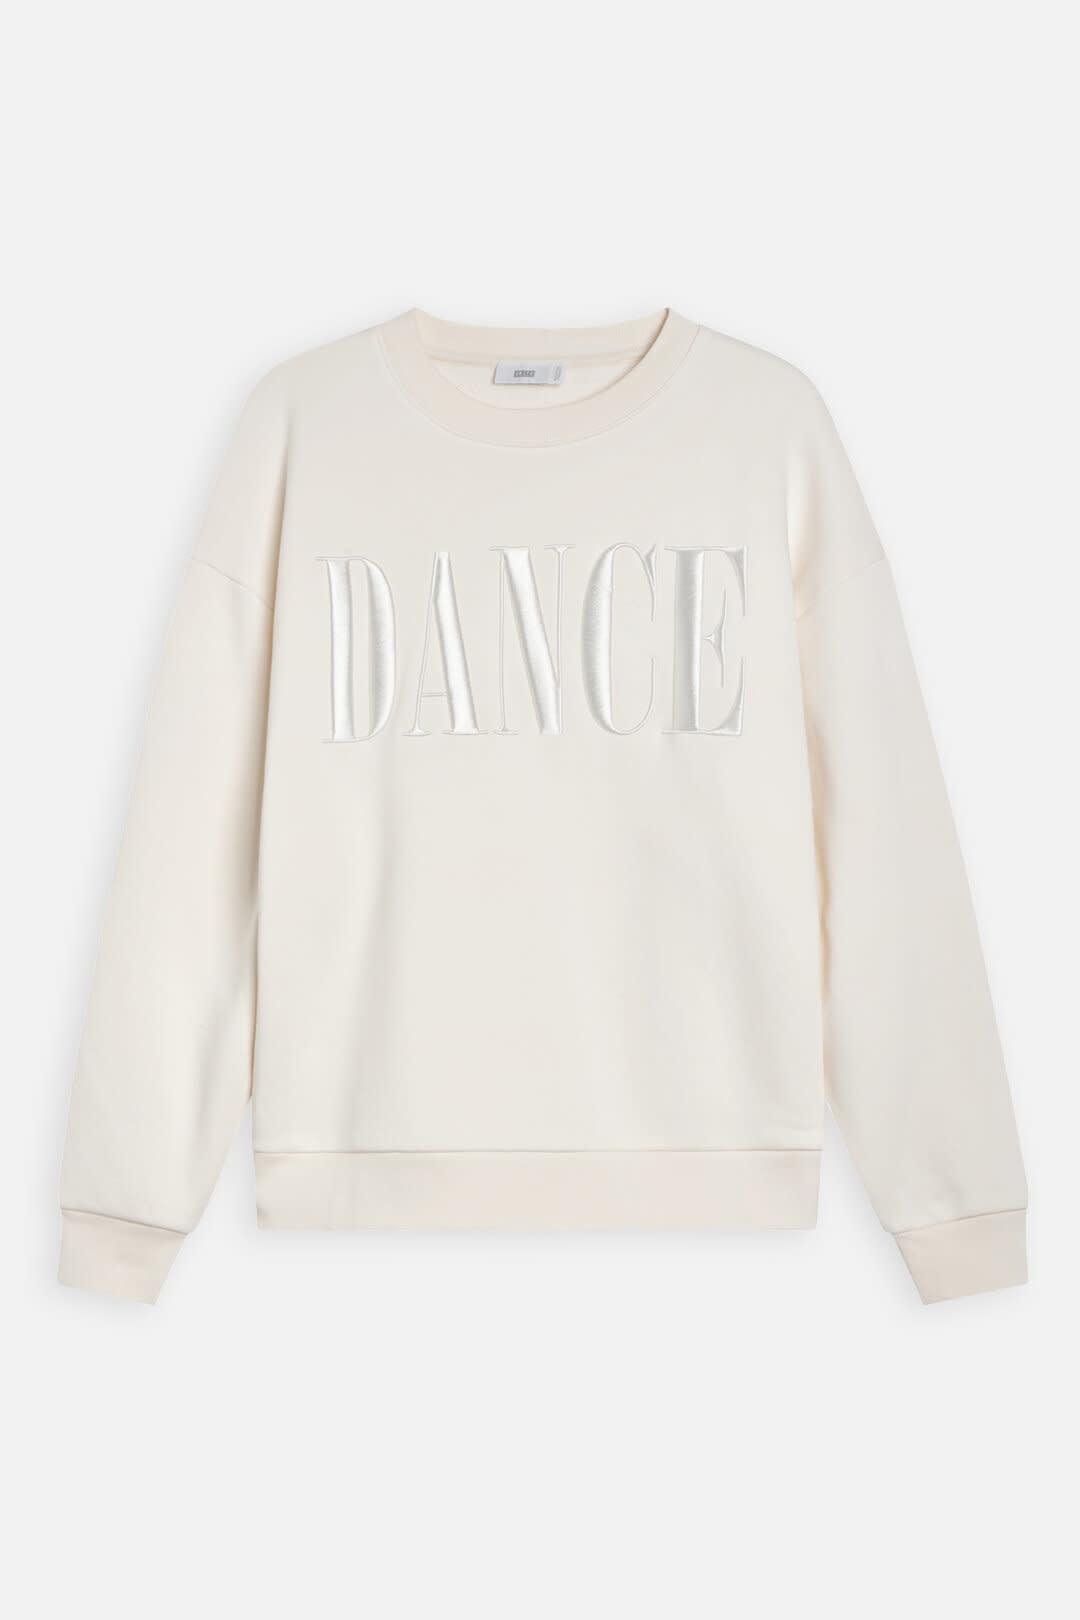 Dance sweater vanilla-1